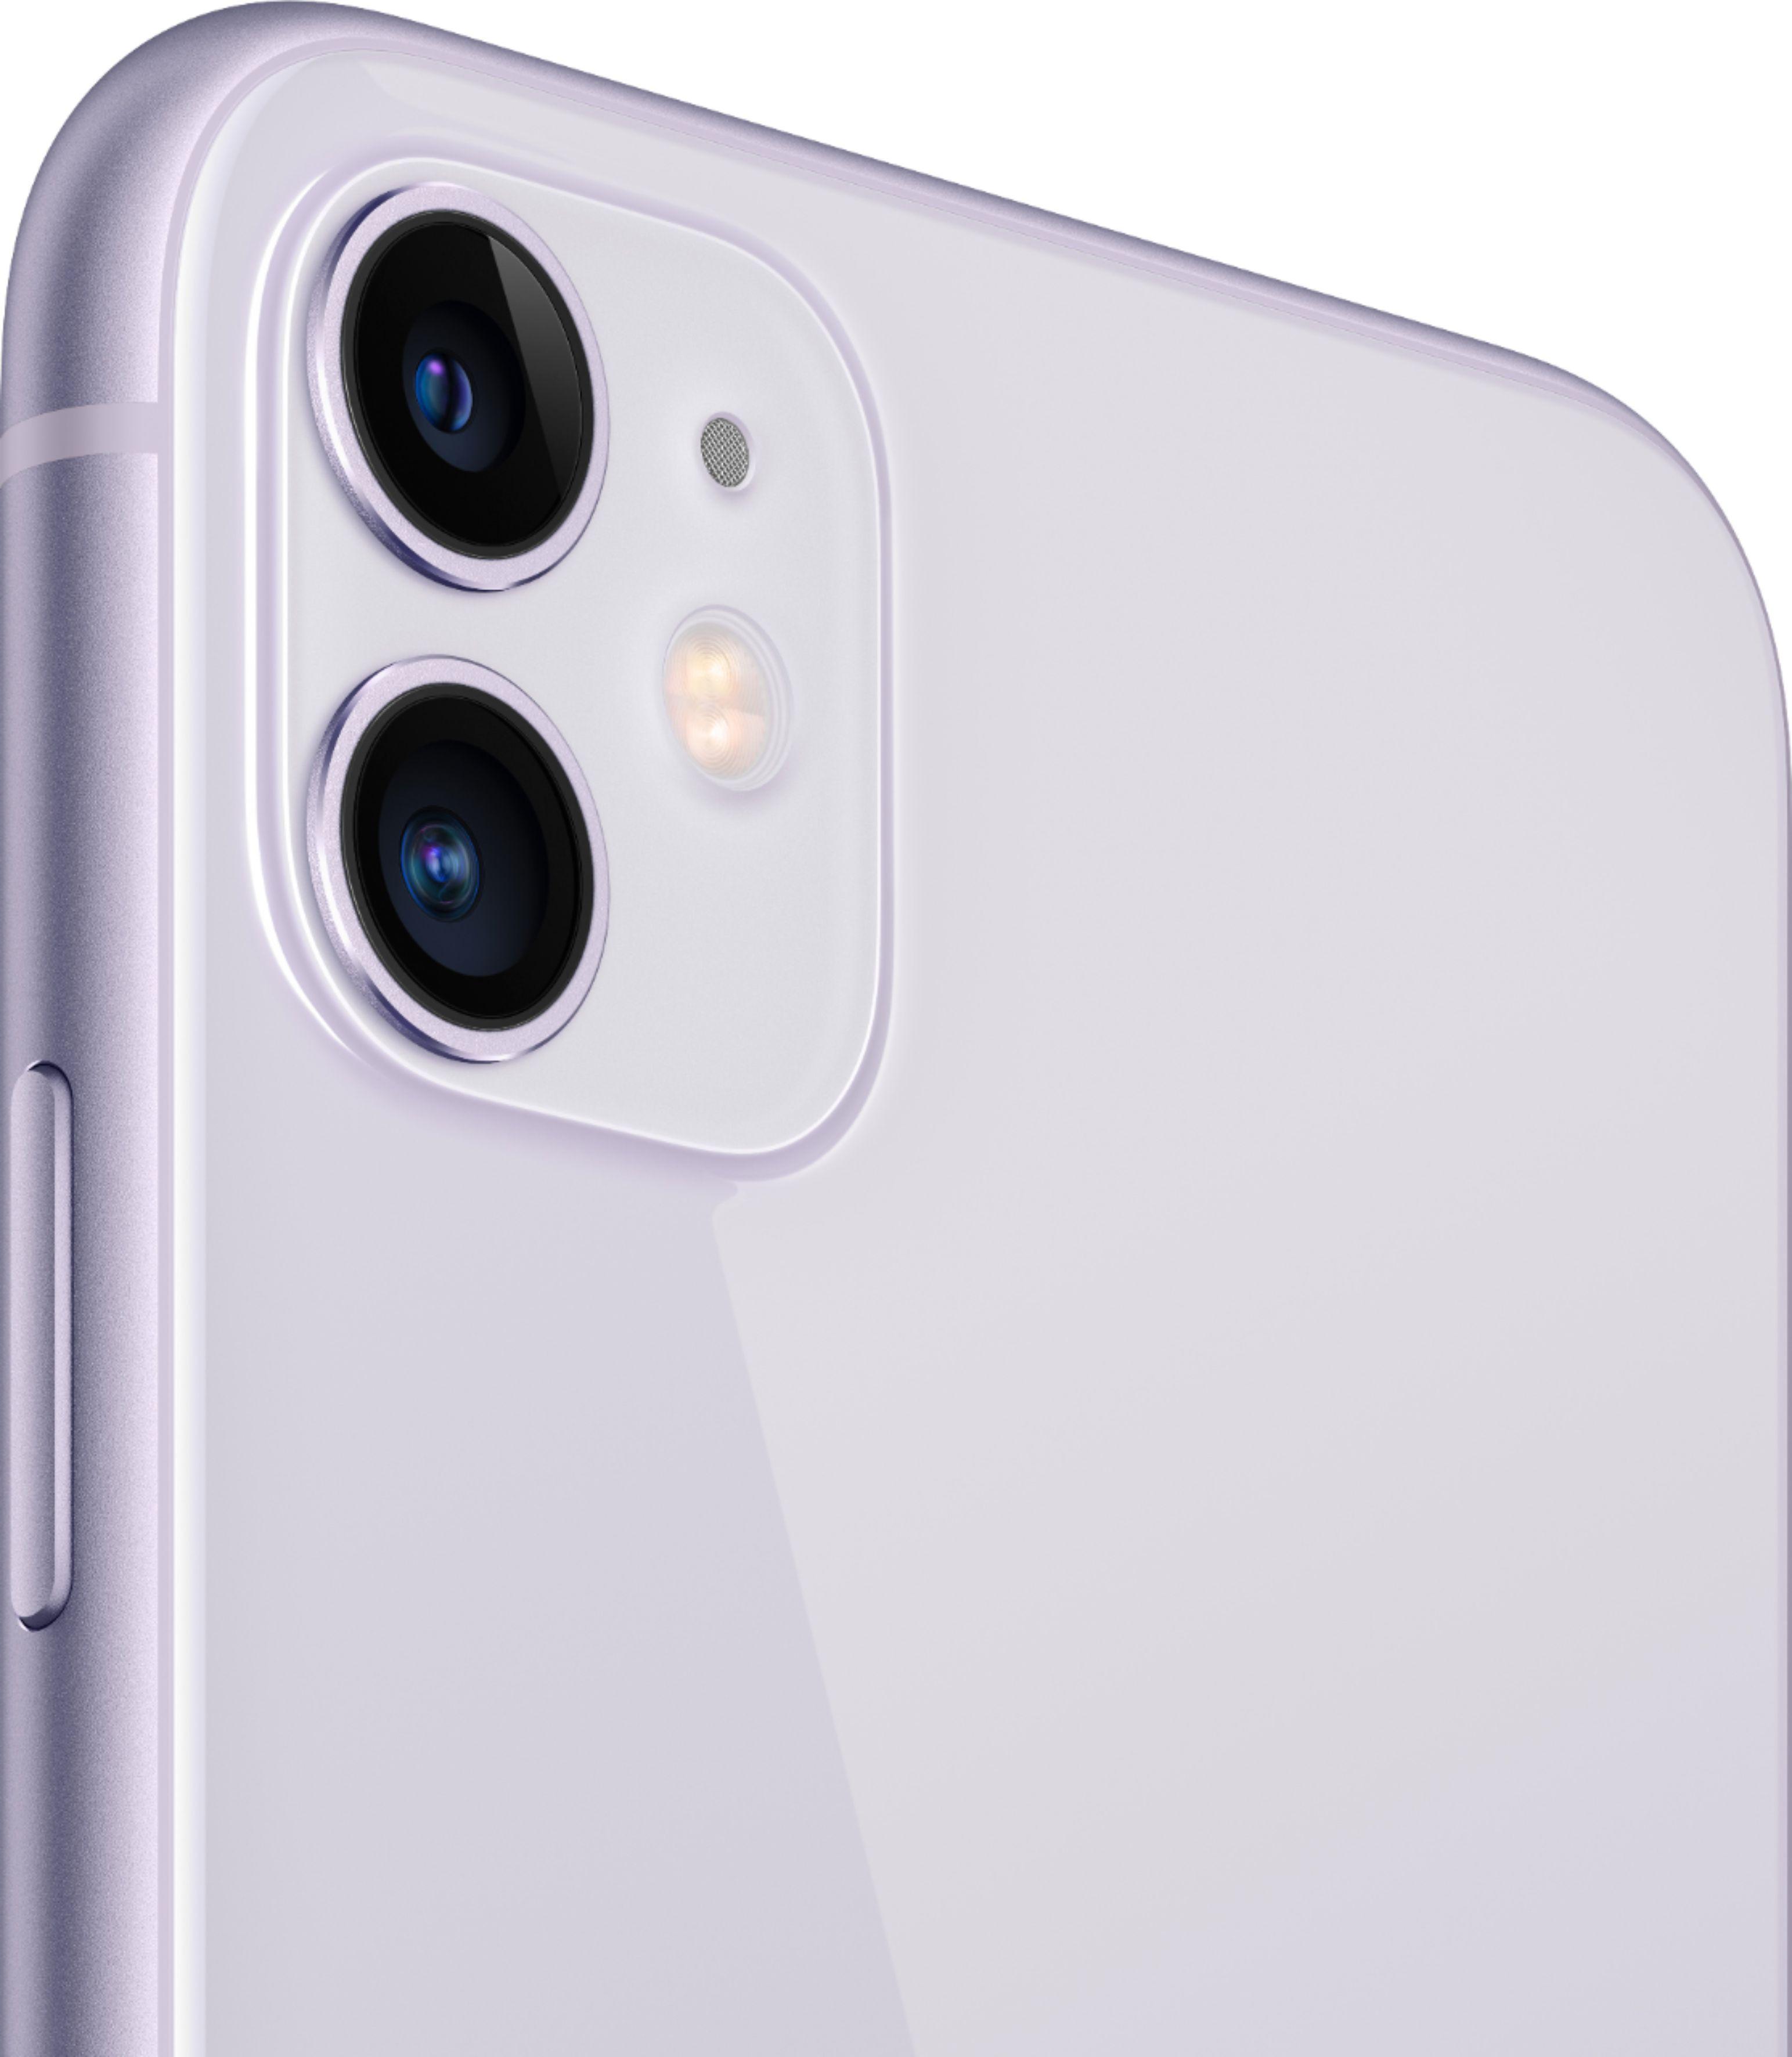 thumbnail 11 - Apple iPhone 11 64GB Factory Unlocked 4G LTE Smartphone